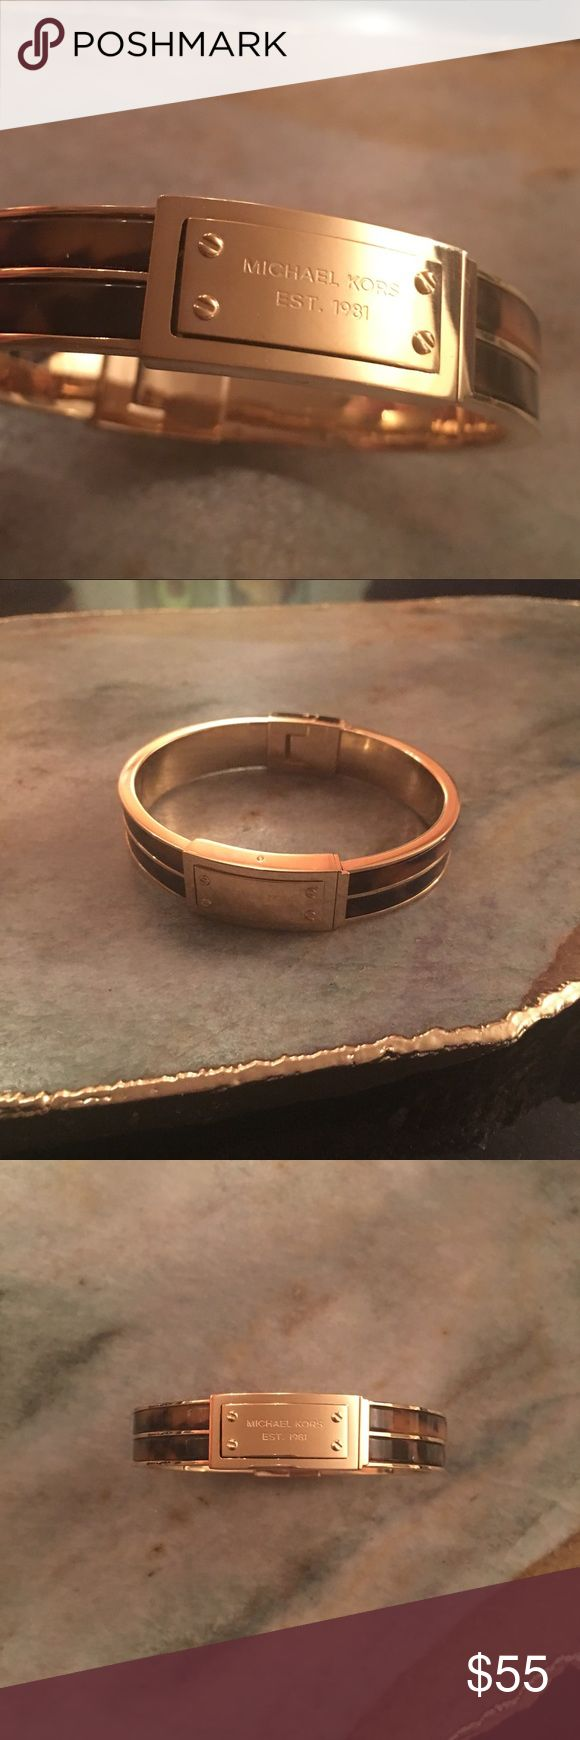 Michael Khors Tortoise Bangle Michael Kors hinged bangle. Gold and tortoise. Michael Kors Jewelry Bracelets